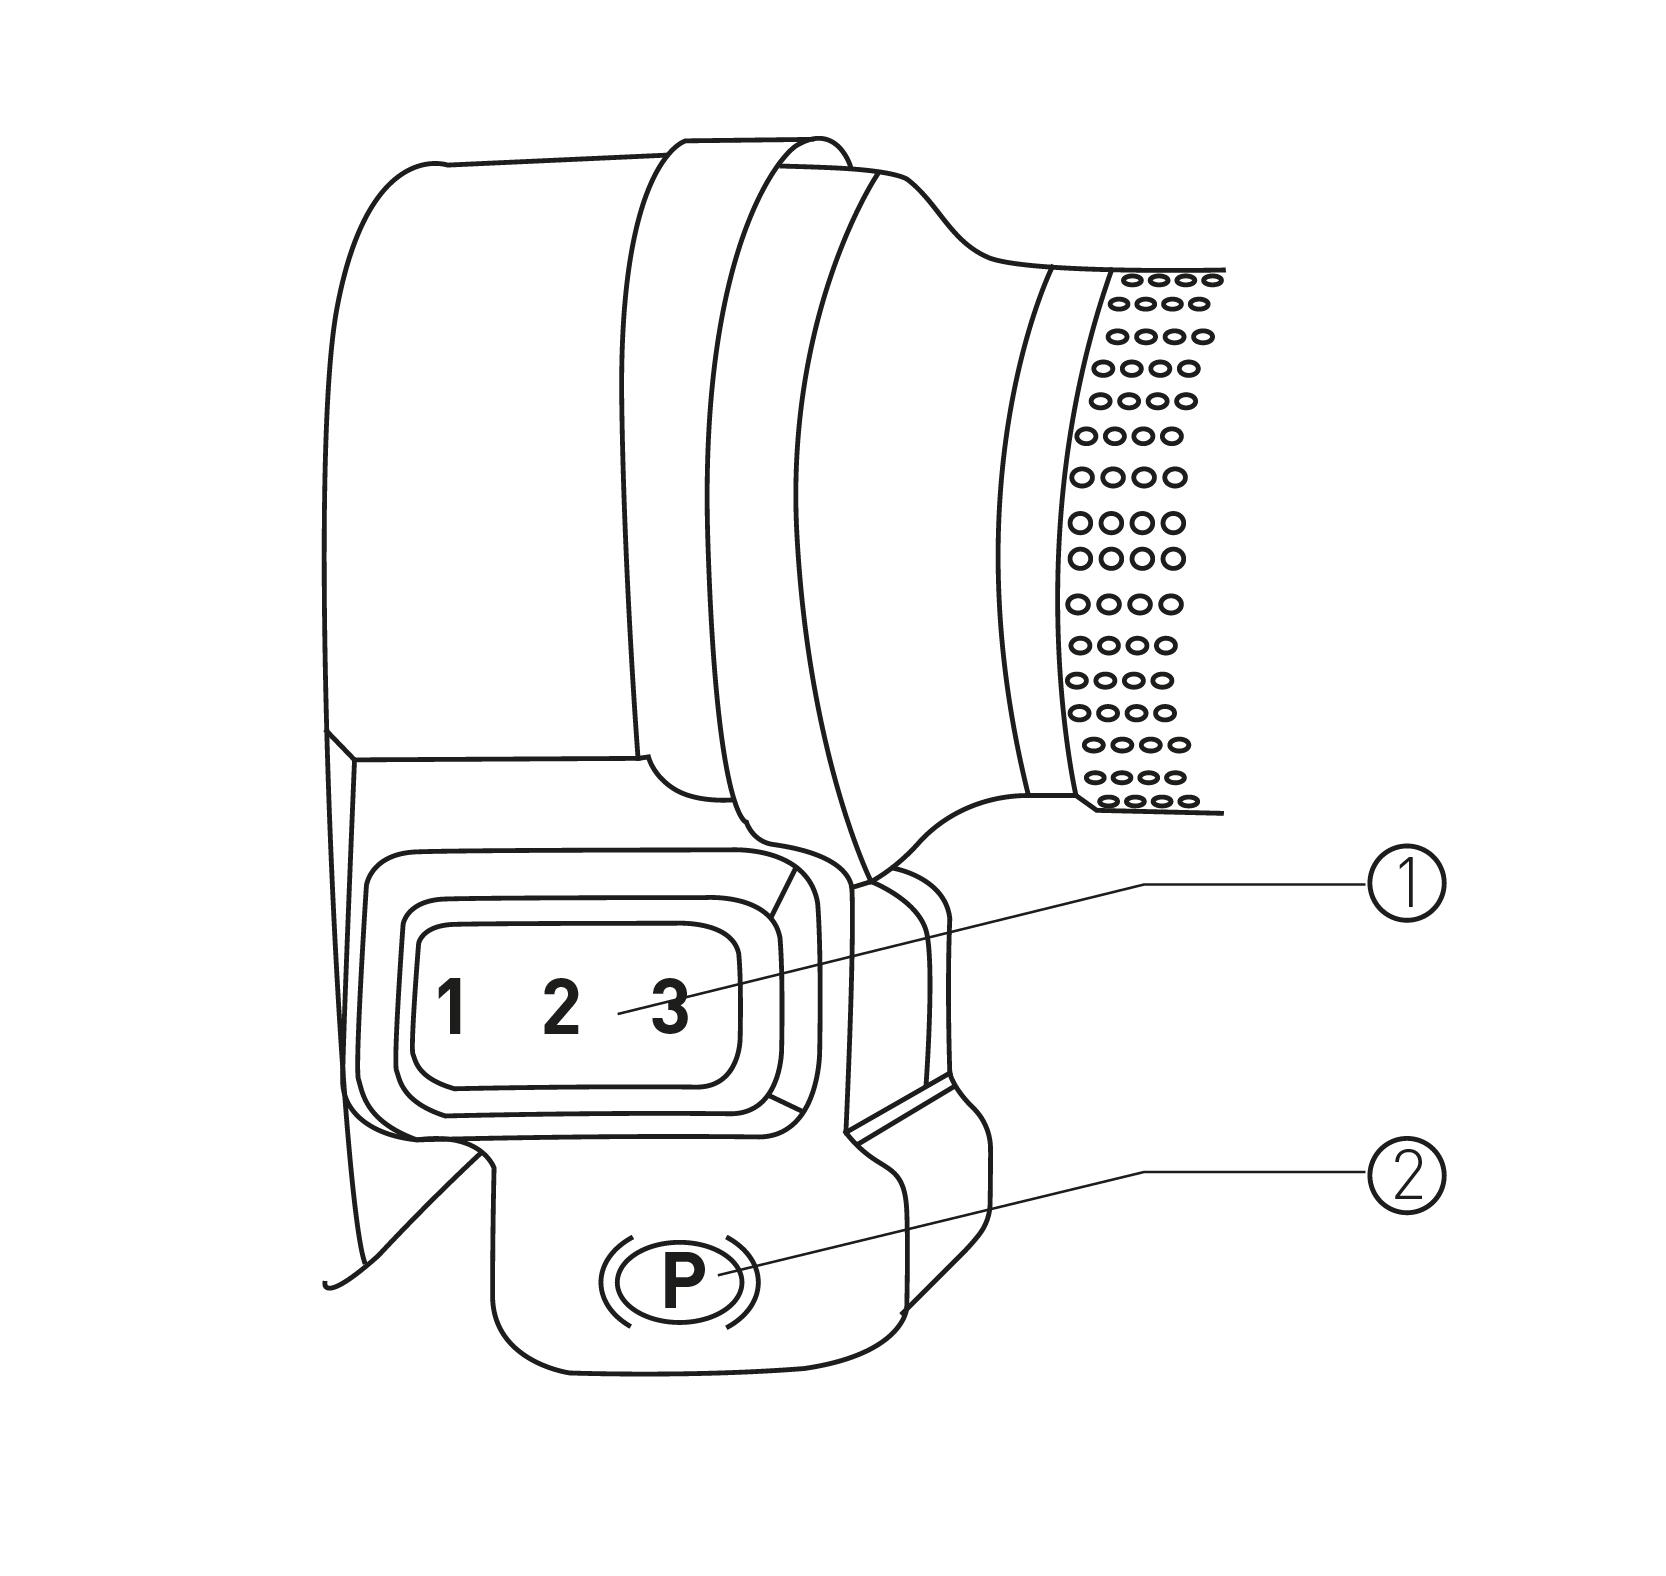 Rechte Startknopf-Armaturen des S6 max Elektro-Motorrollers von Nova Motors